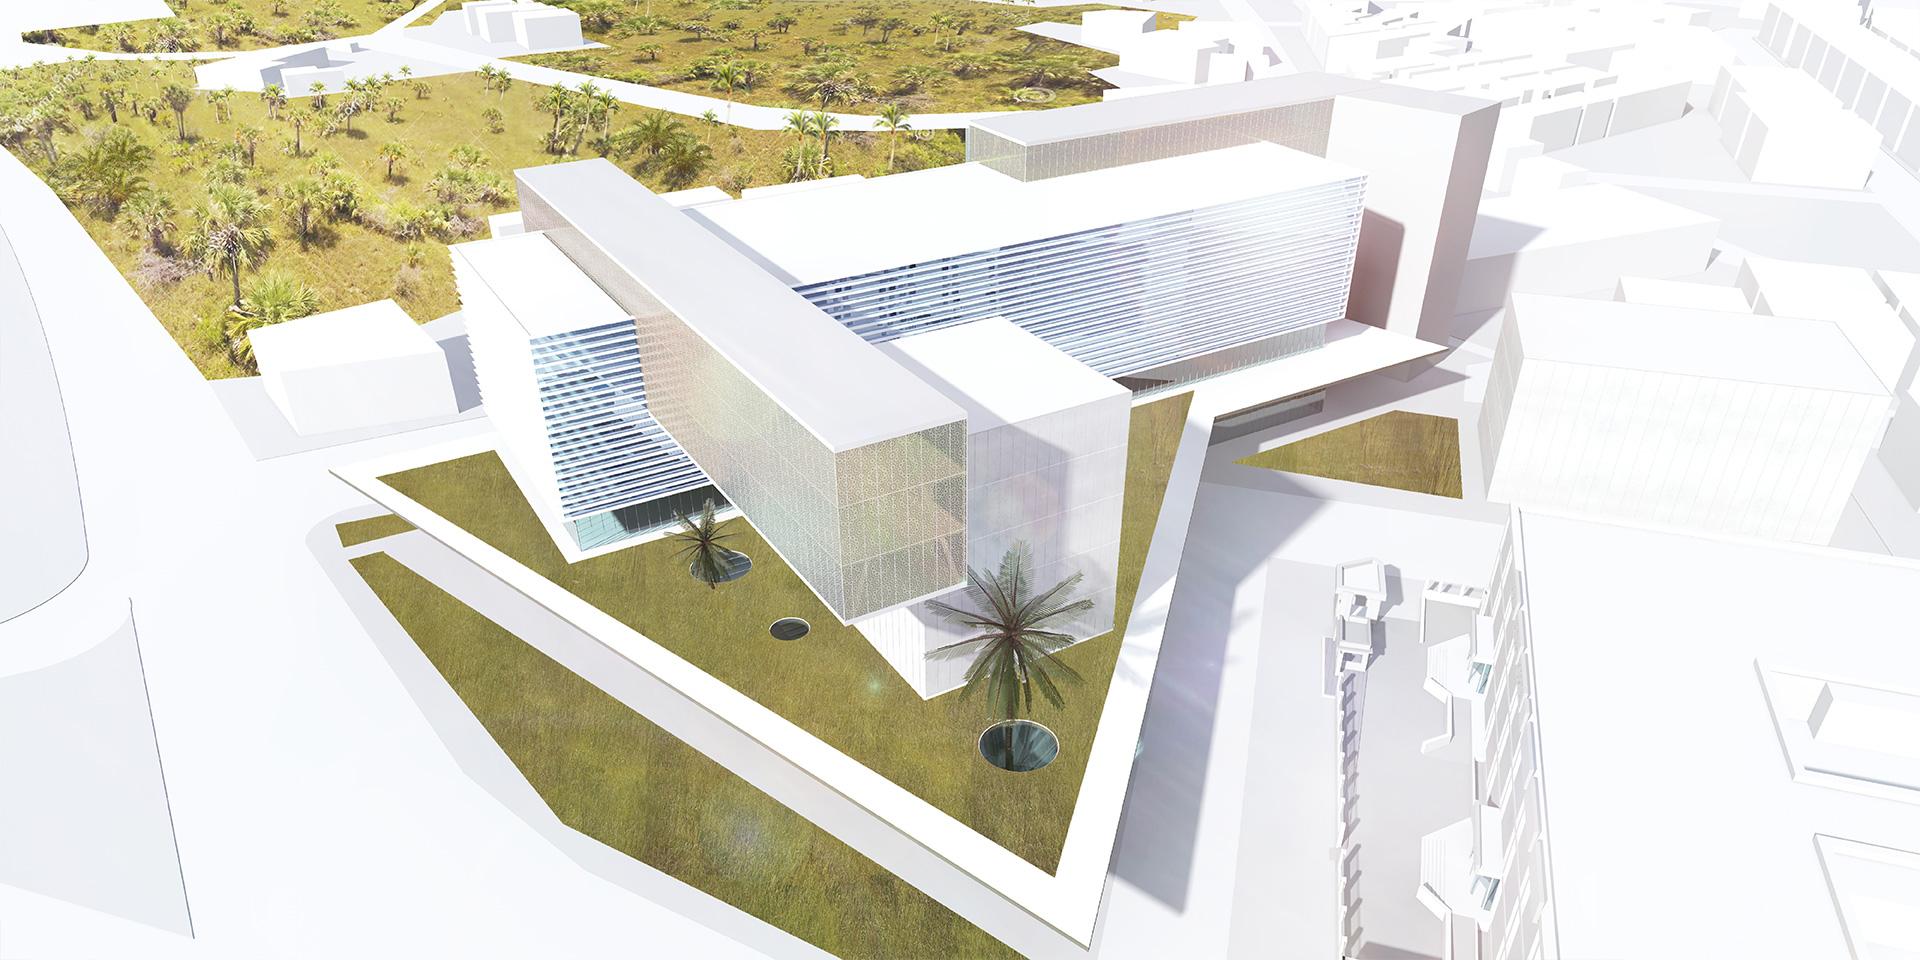 Heart Oncology Institute Medina, Arabia Saudita, Binini Partners, Società di architettura e ingegneria